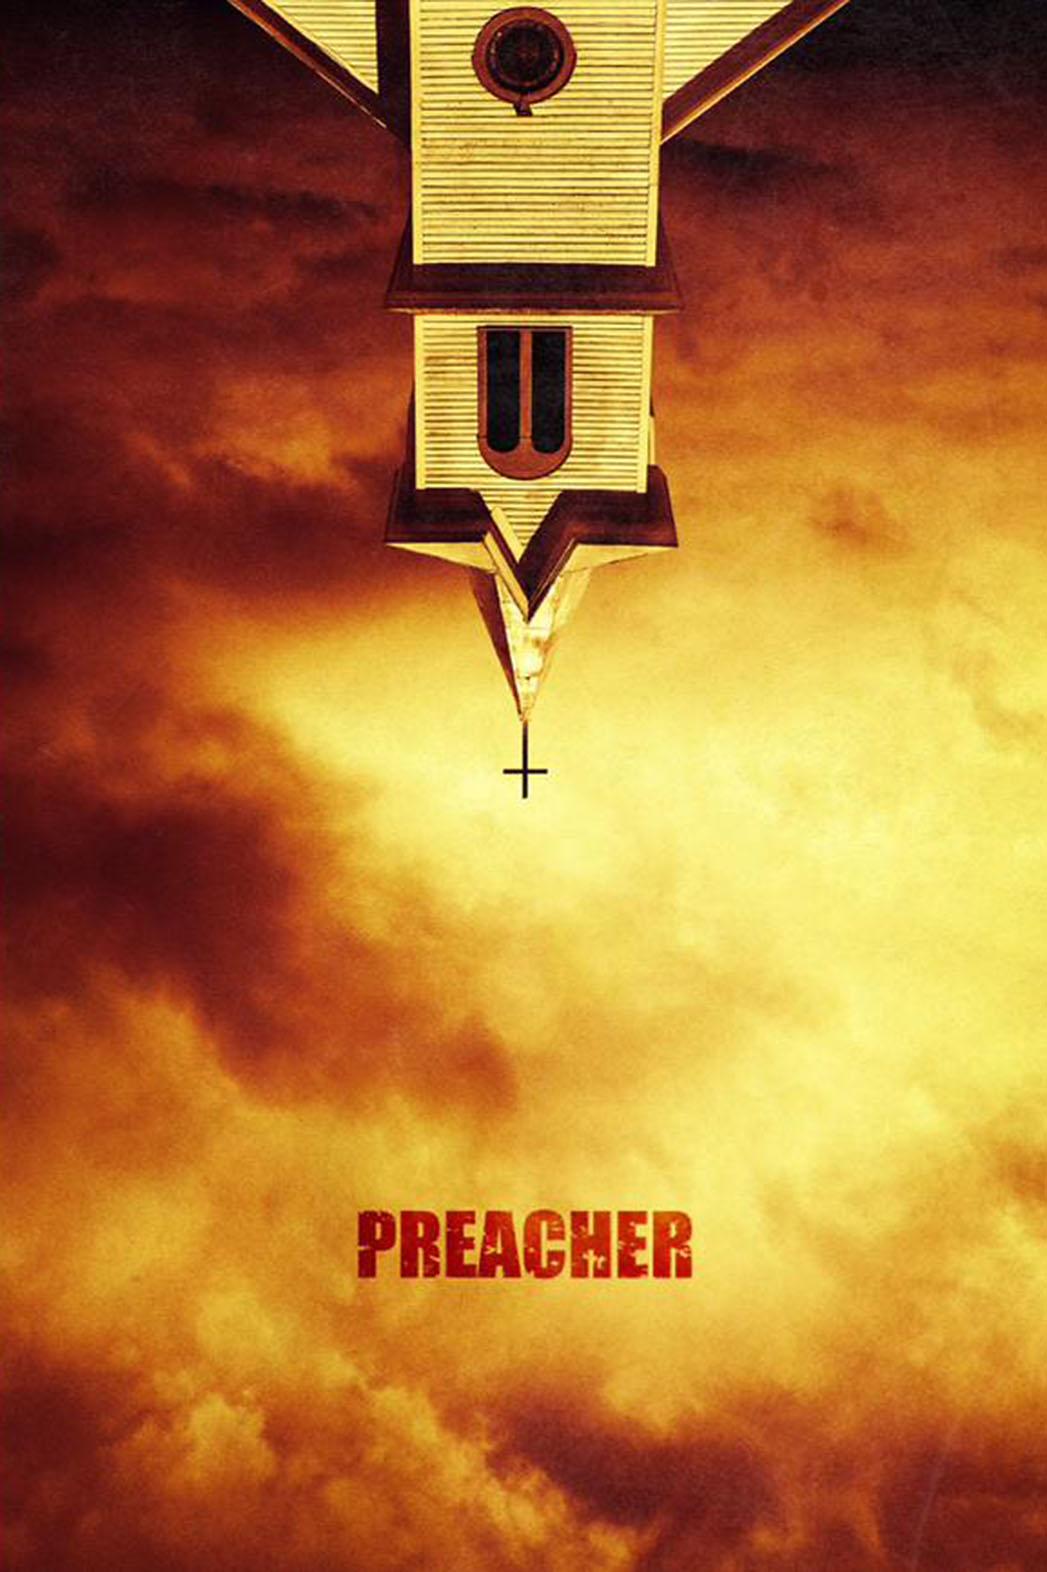 Preacher Poster Key Art - P 2015